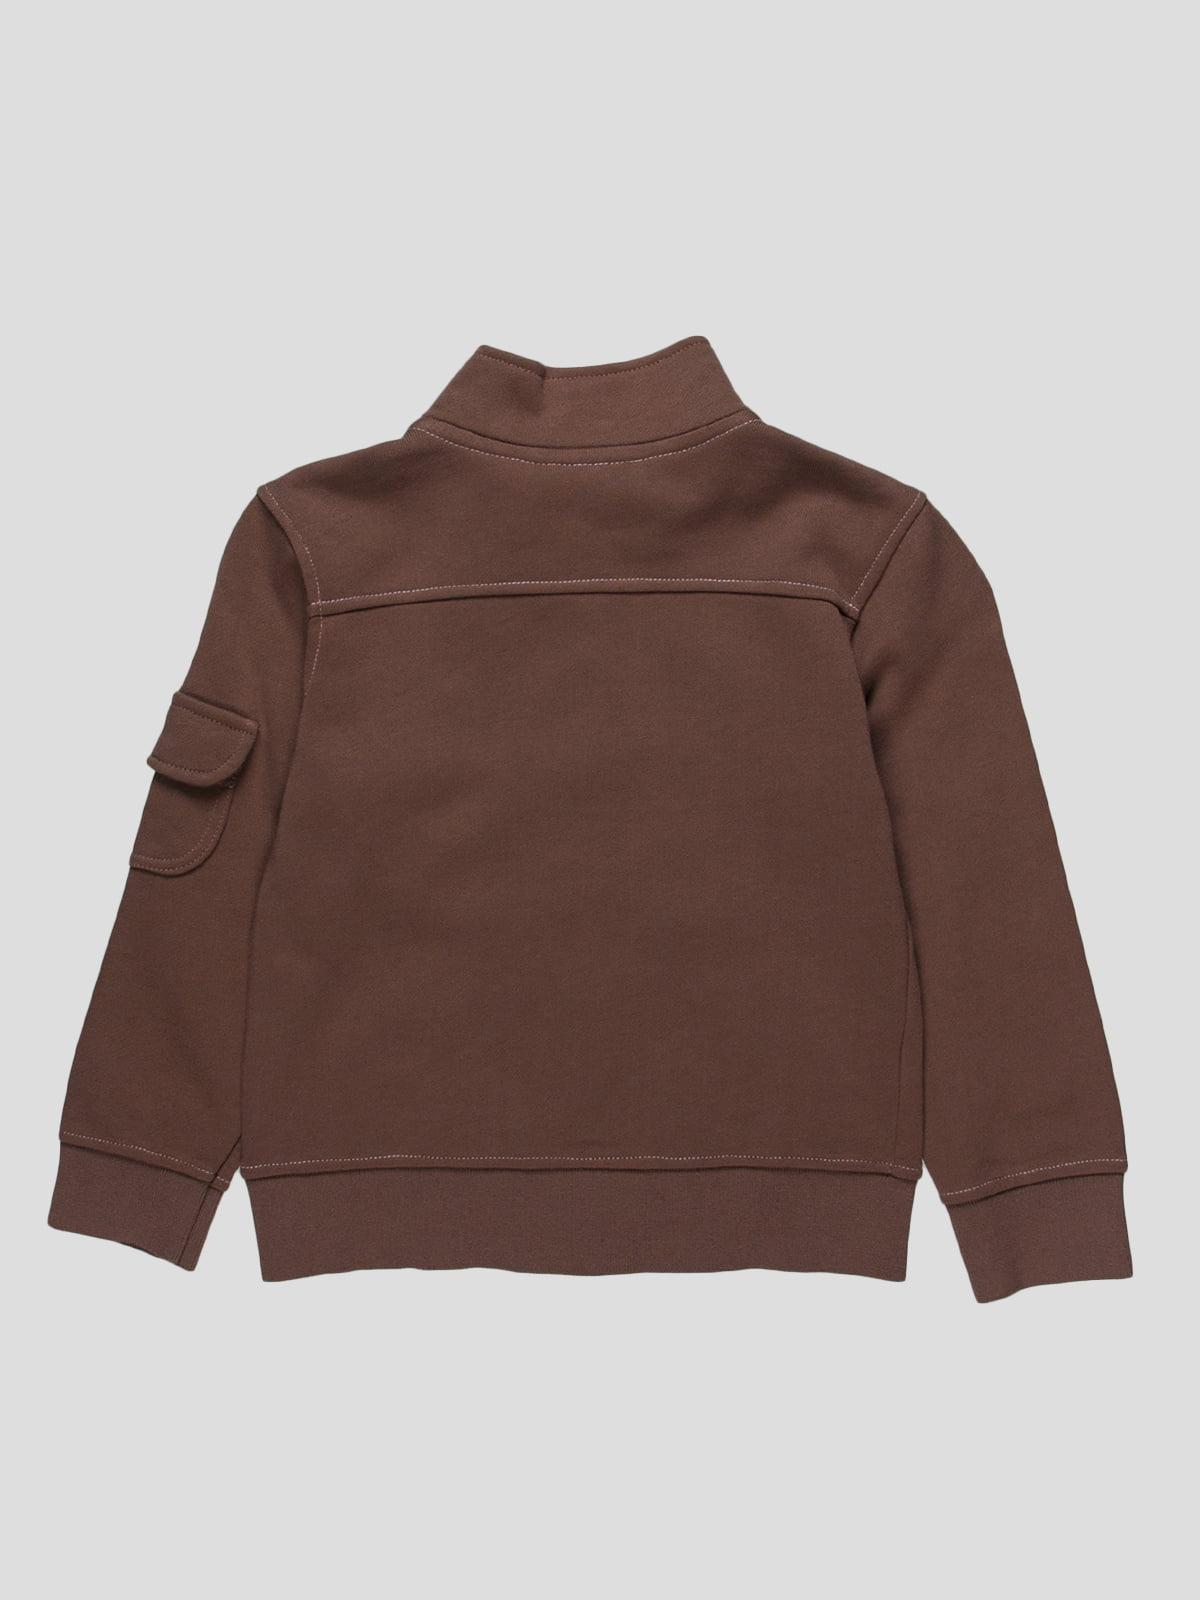 Кофта коричневая | 72810 | фото 2